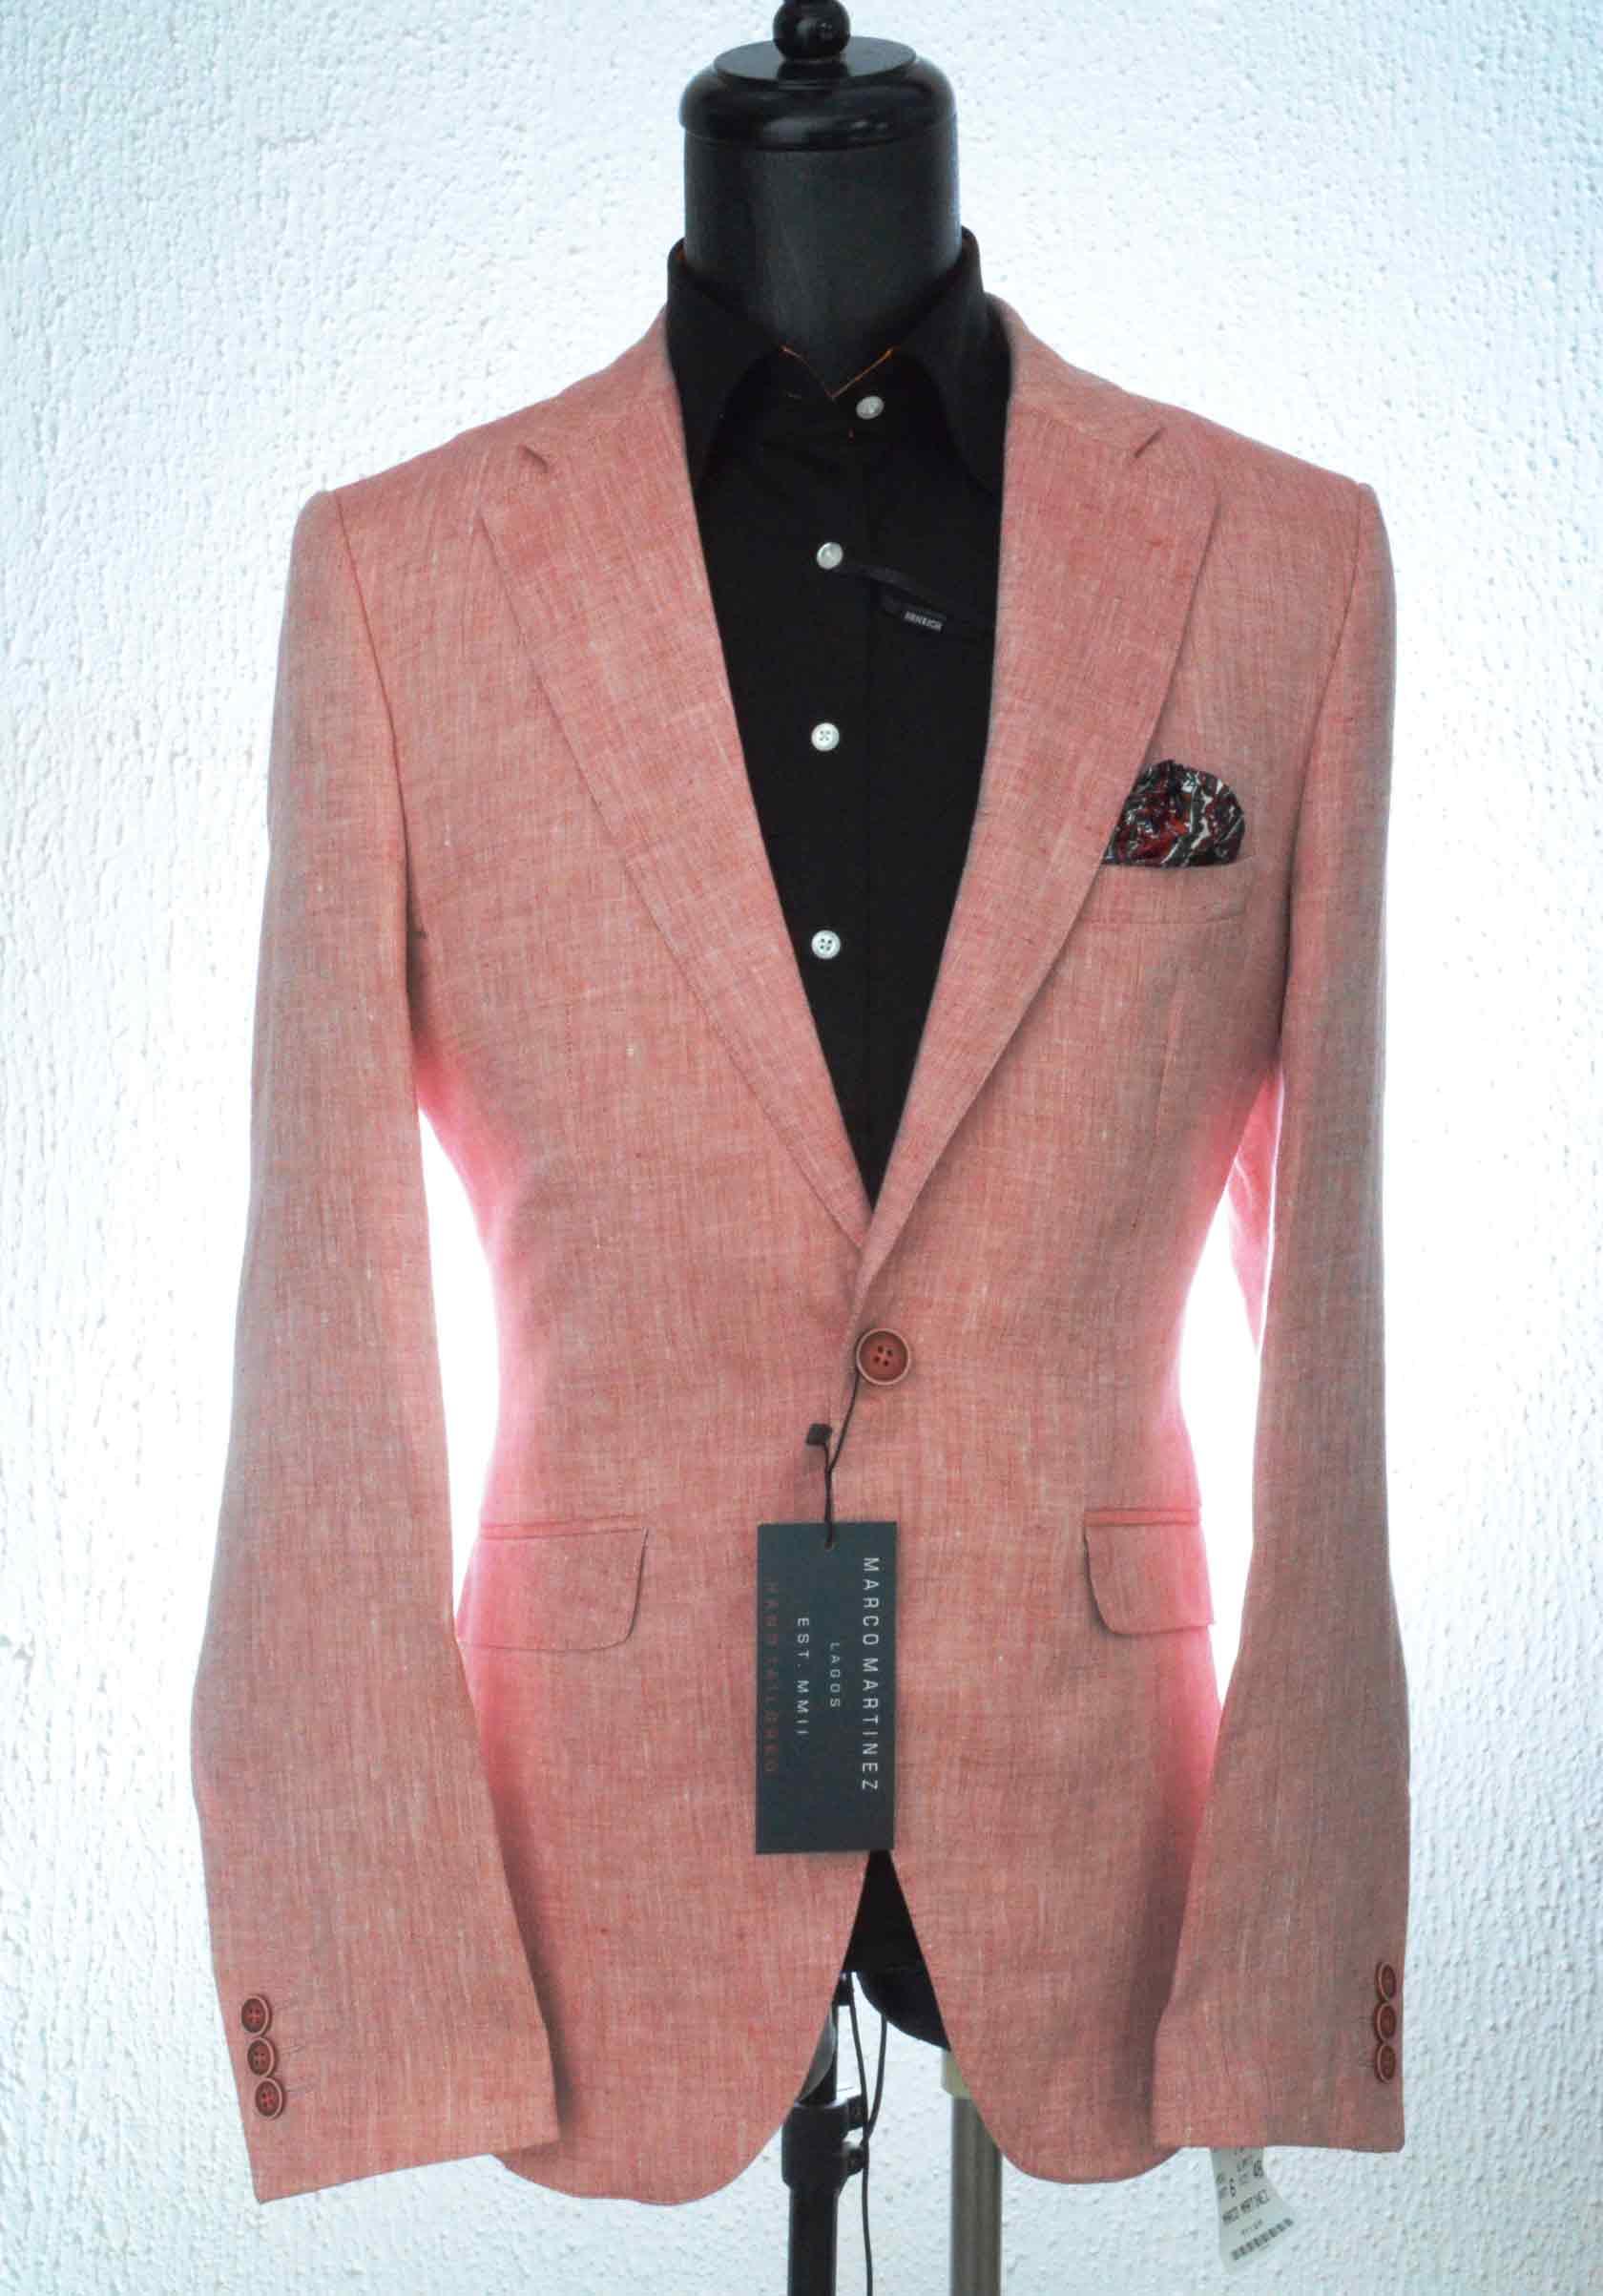 MRC Peach Linen Jacket - Marco Martinez Lagos Marco Martinez